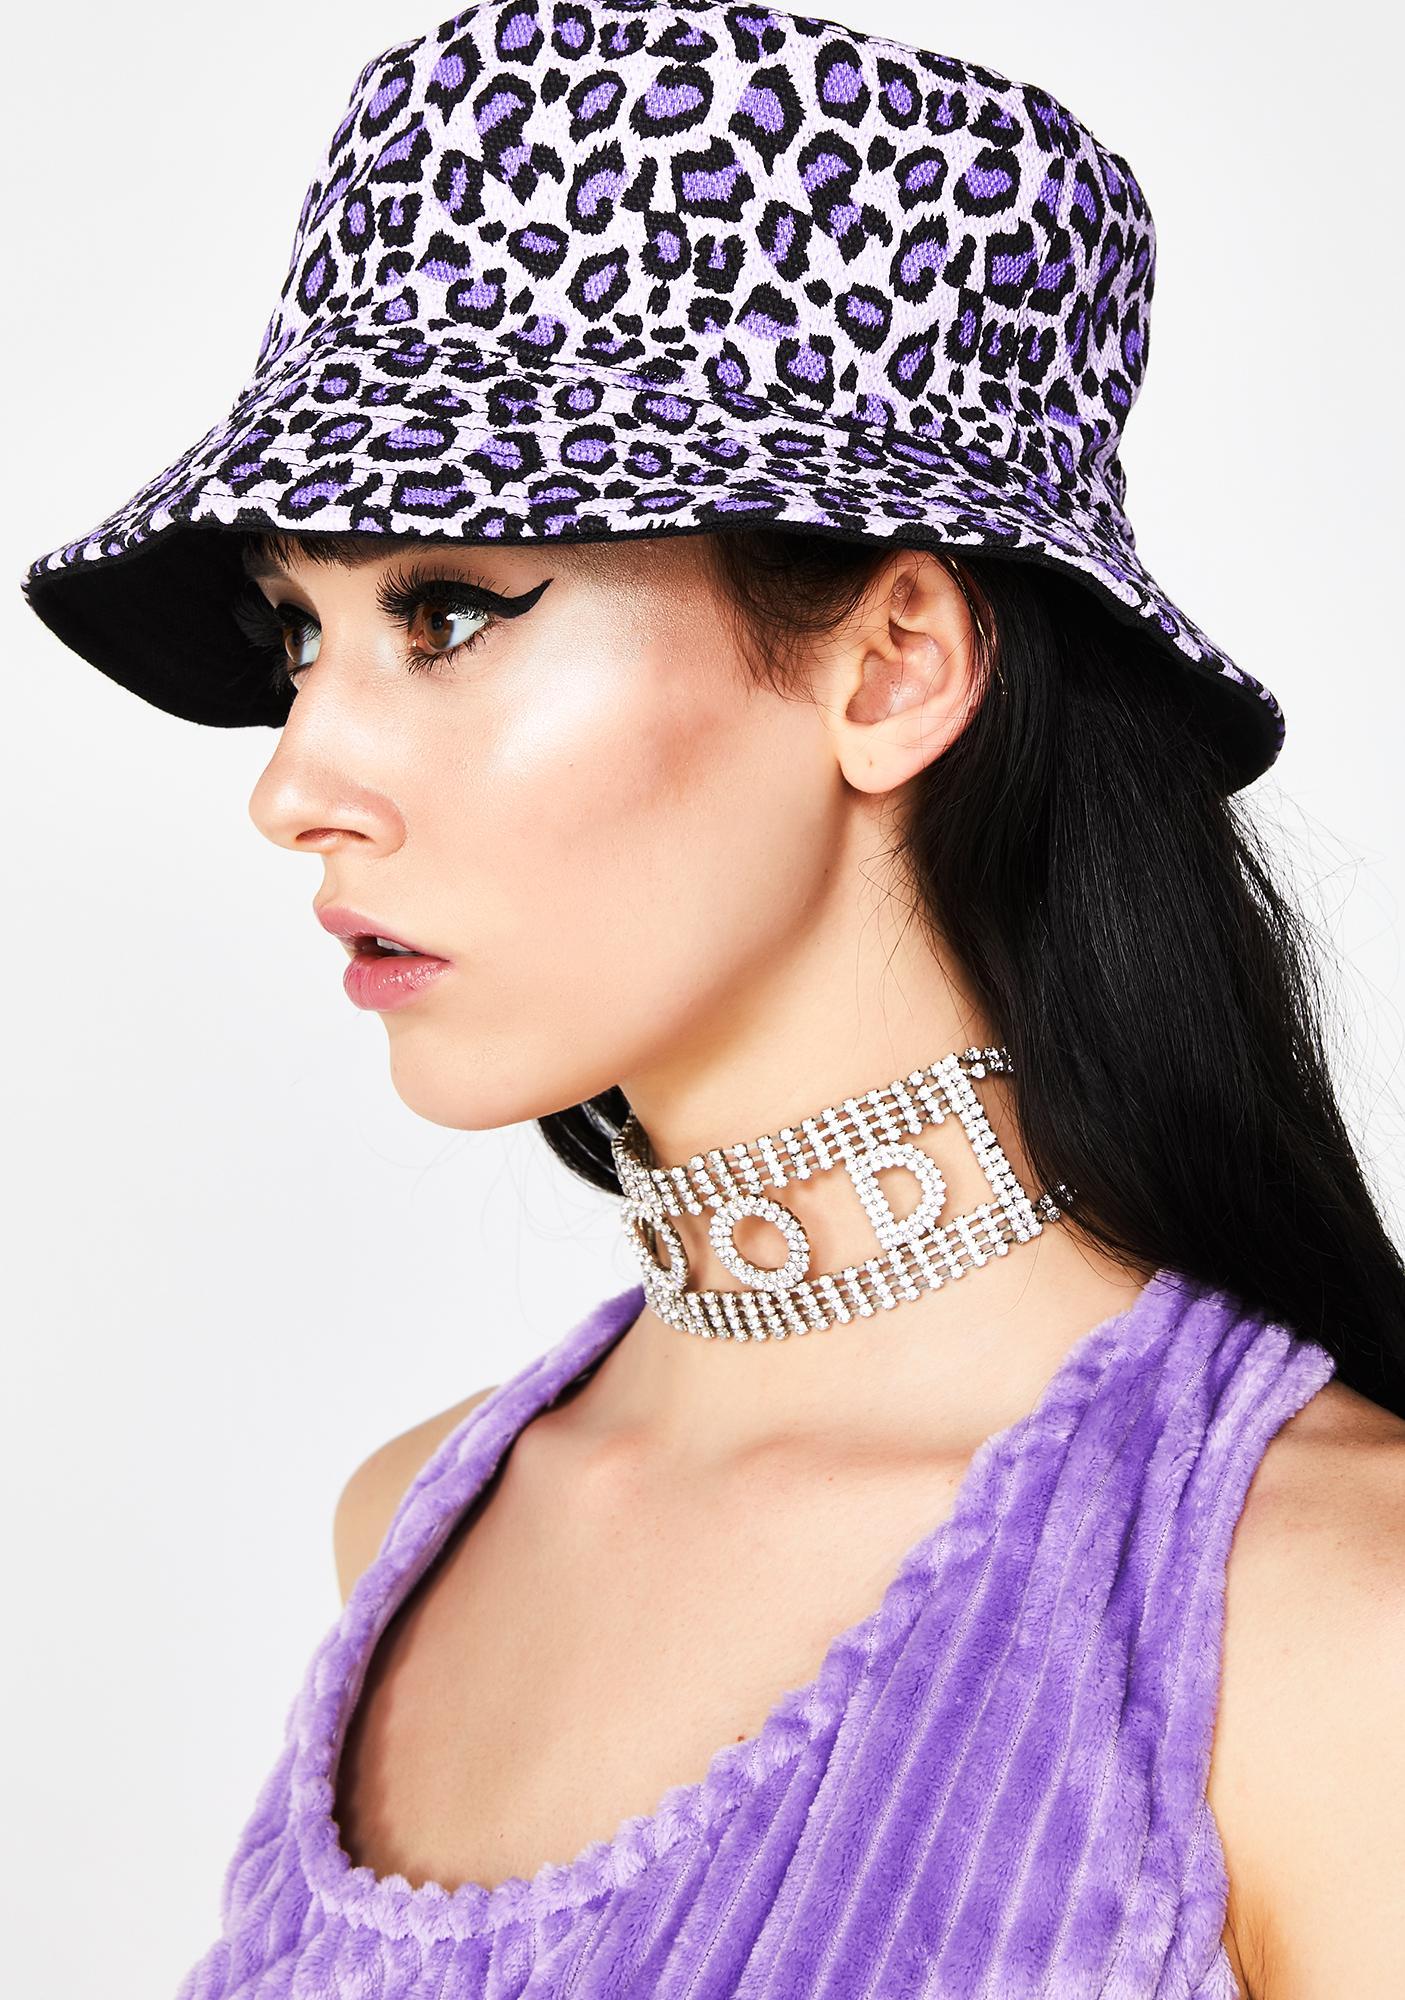 ... Make Me Purr Leopard Bucket Hat 6310f4065a0